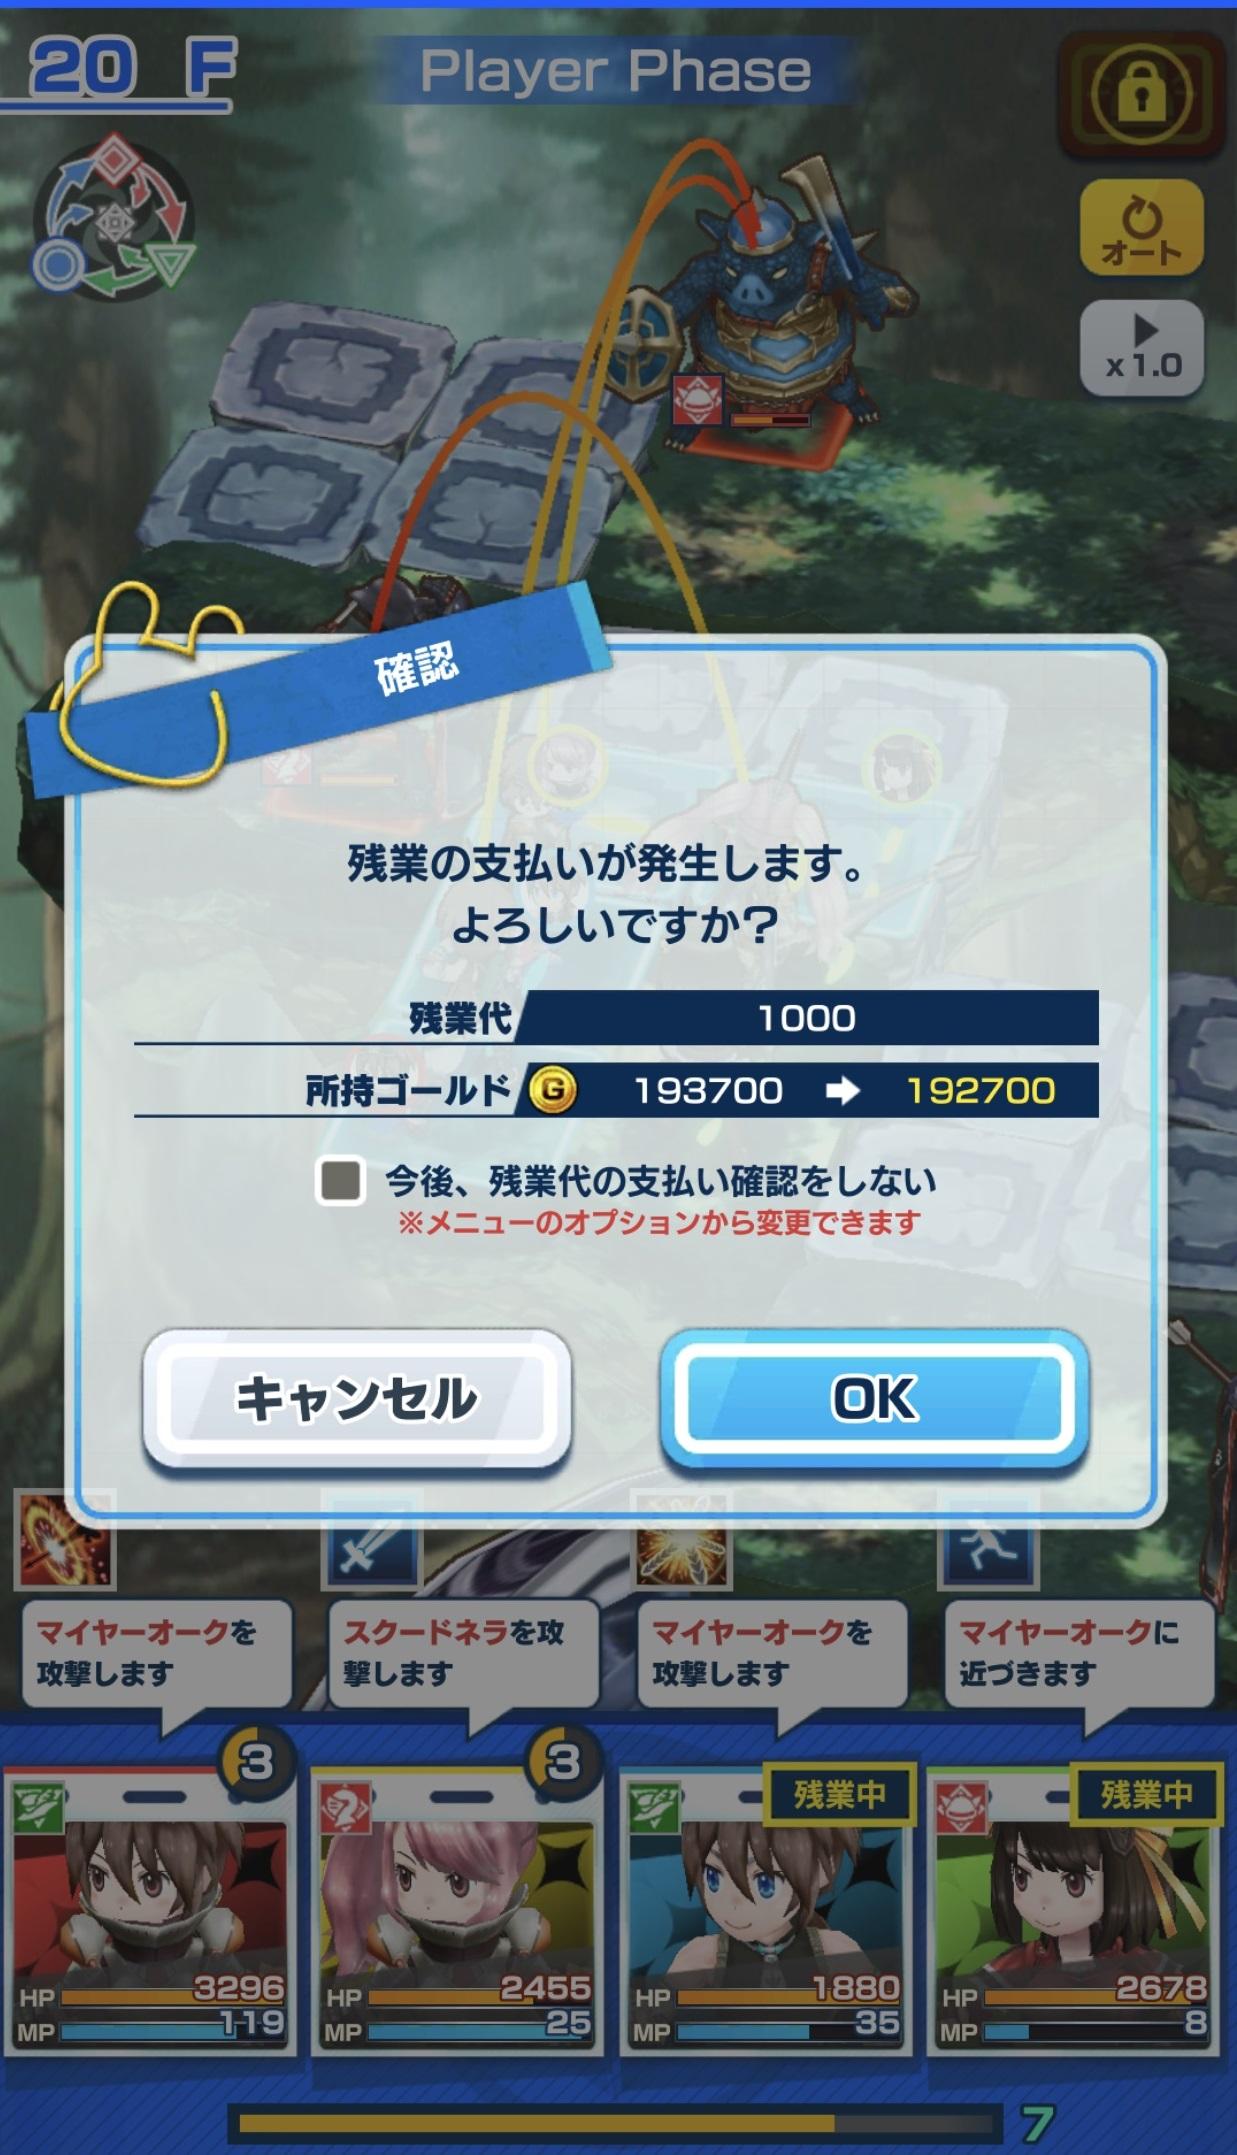 /theme/dengekionline/shachibato/images/system/Battle_02